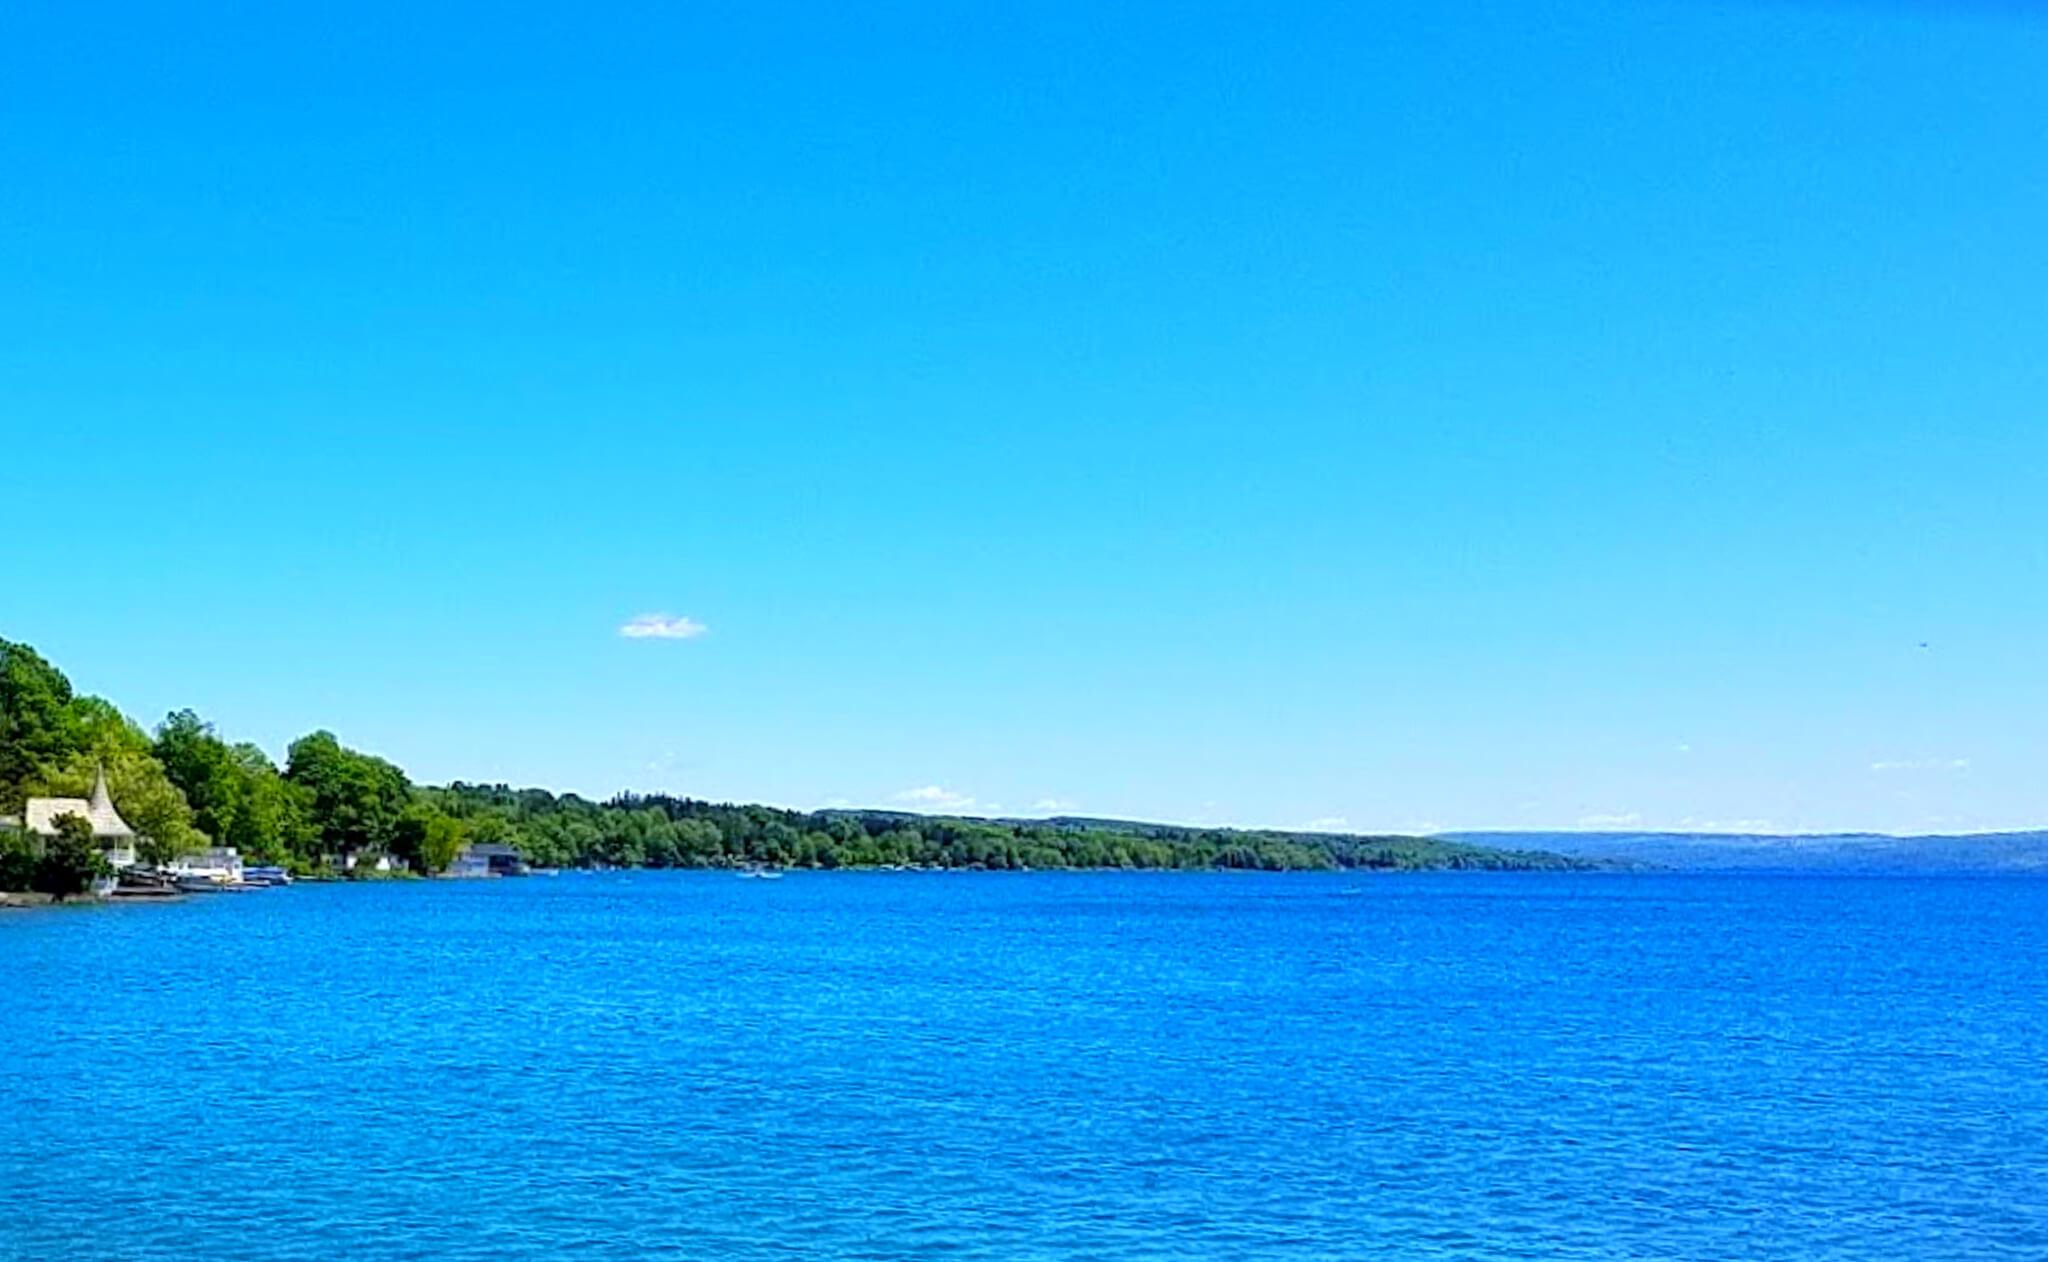 Skaneateles-Lake-Fishing-Report-Guide-New-York-NY-02